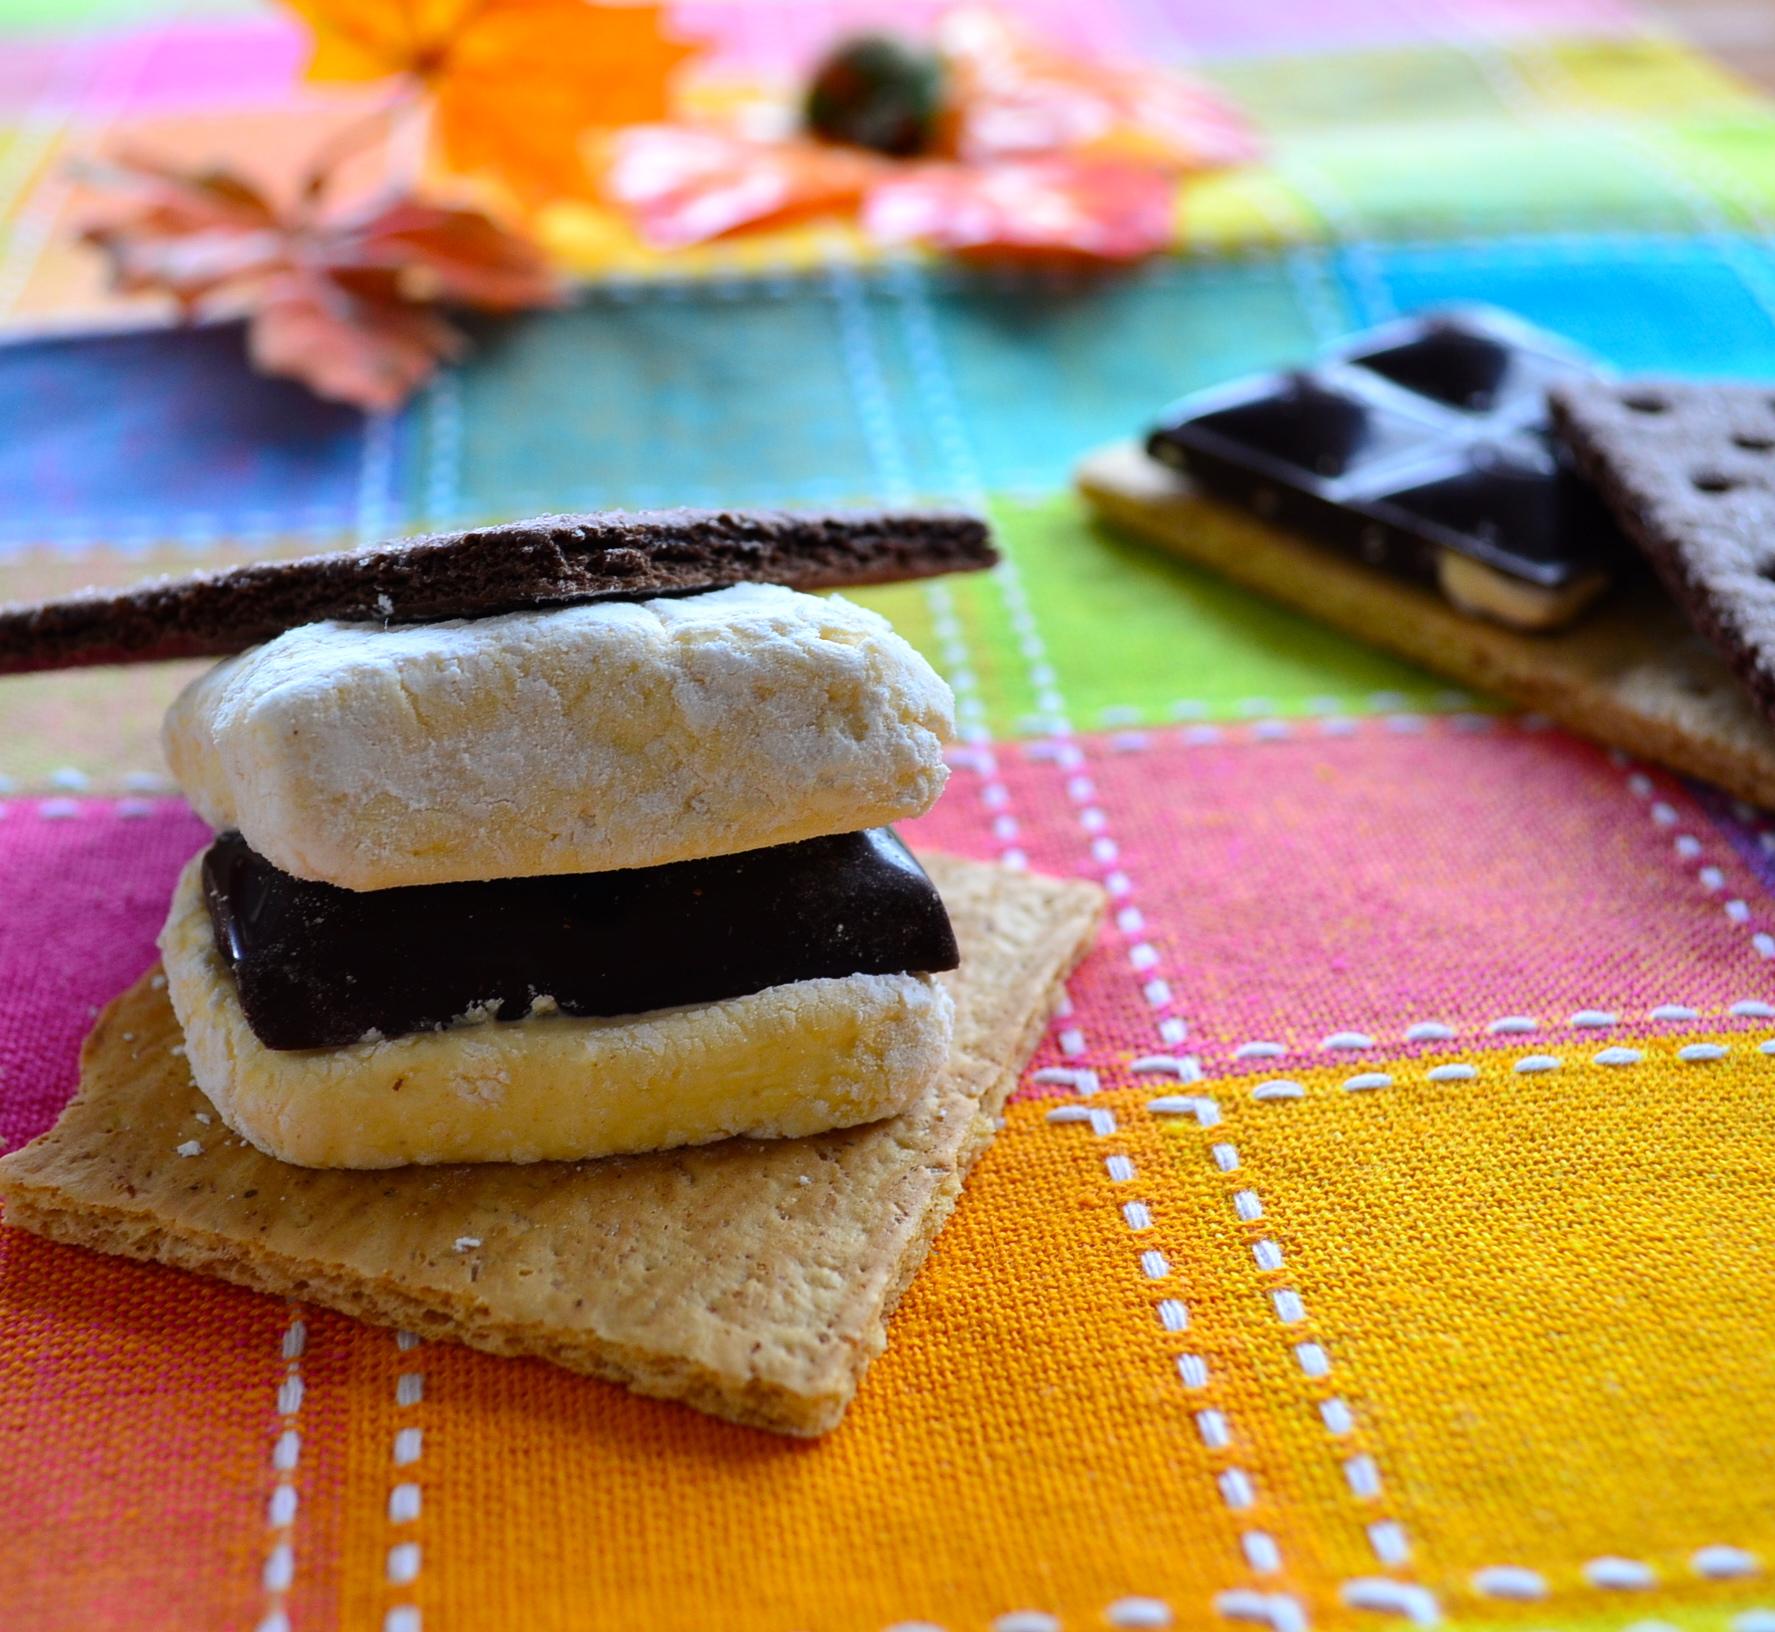 Chocolate Orange Creams Dunmore Candy Kitchen: Orange Cream Vegan Marshmallows